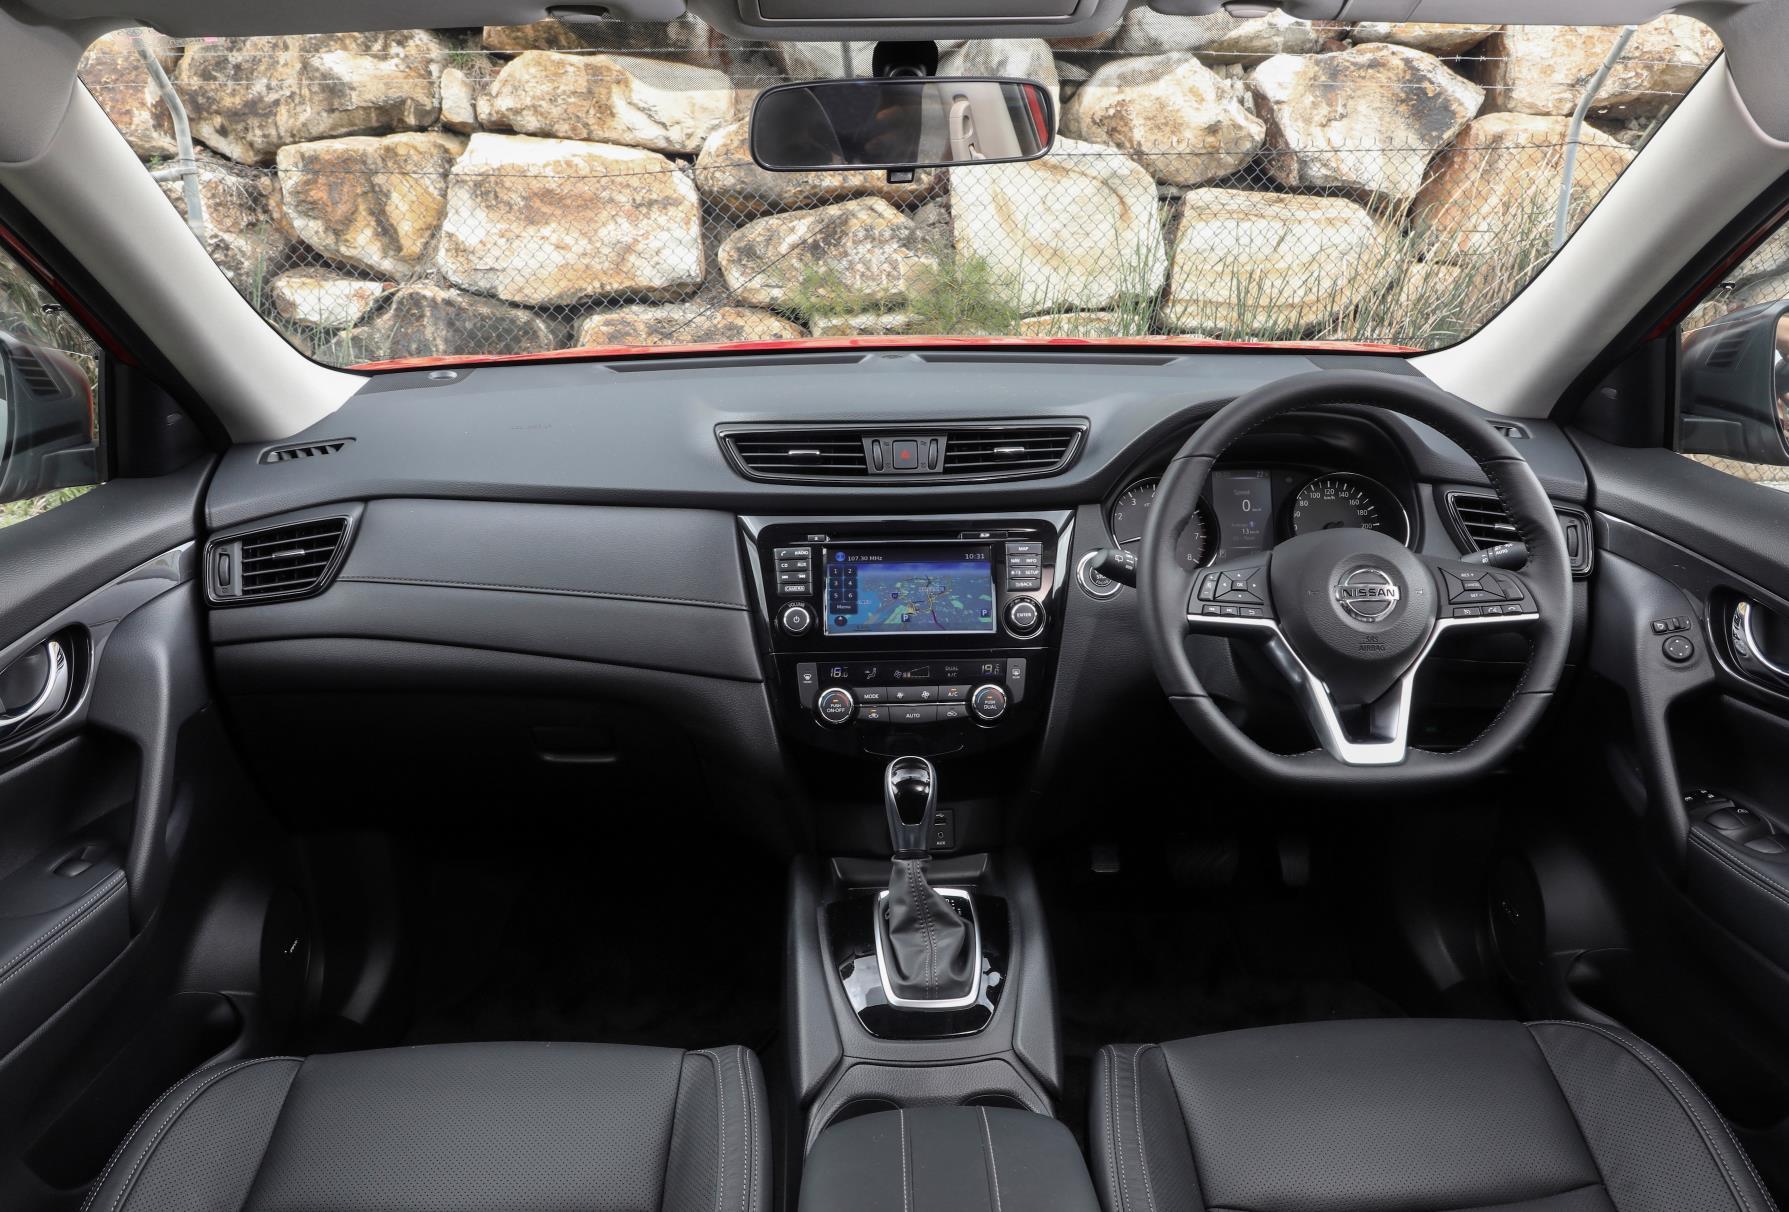 2019 Nissan X-Trail N-TREK edition announced for Australia  PerformanceDrive